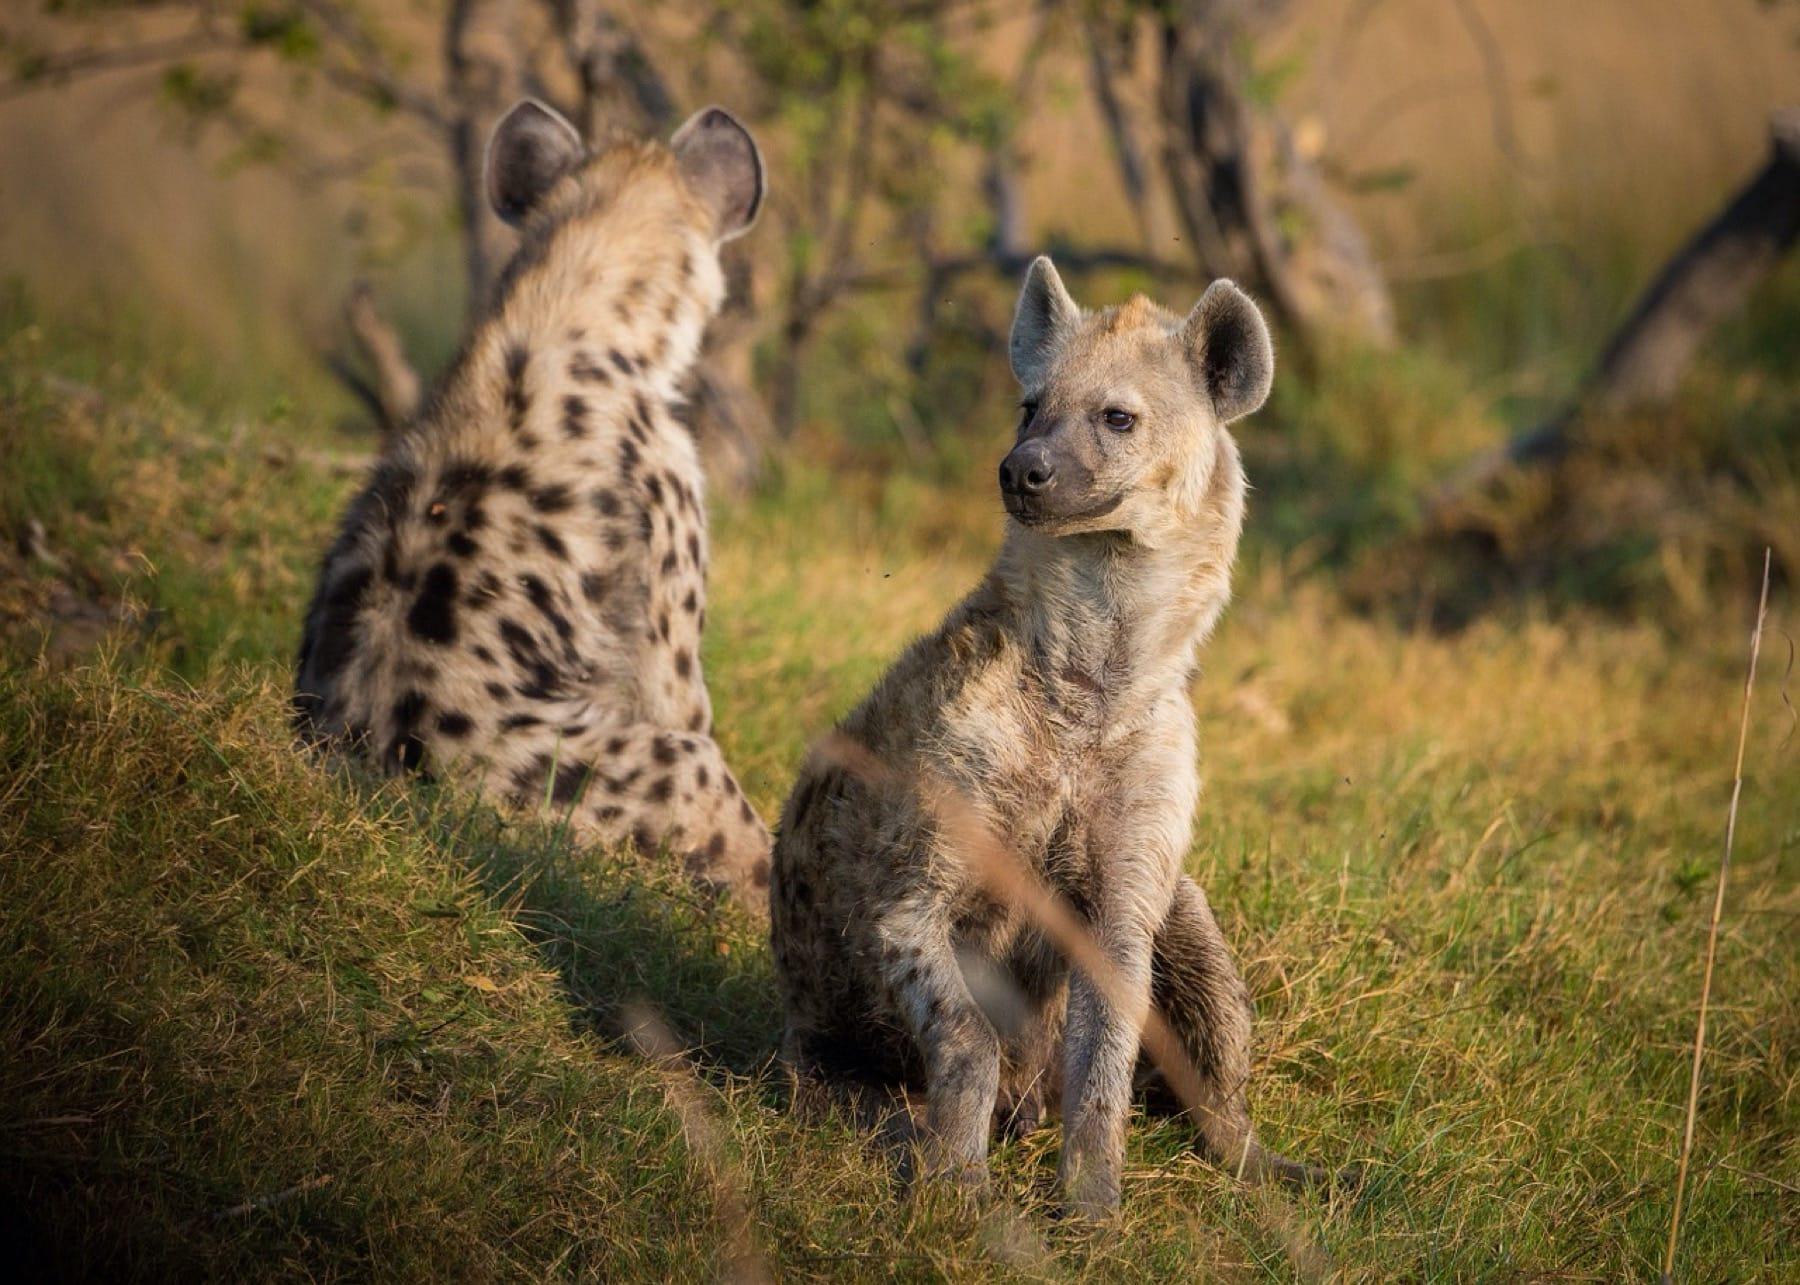 Wildlife_Kenya_Hyena_Masai Mara